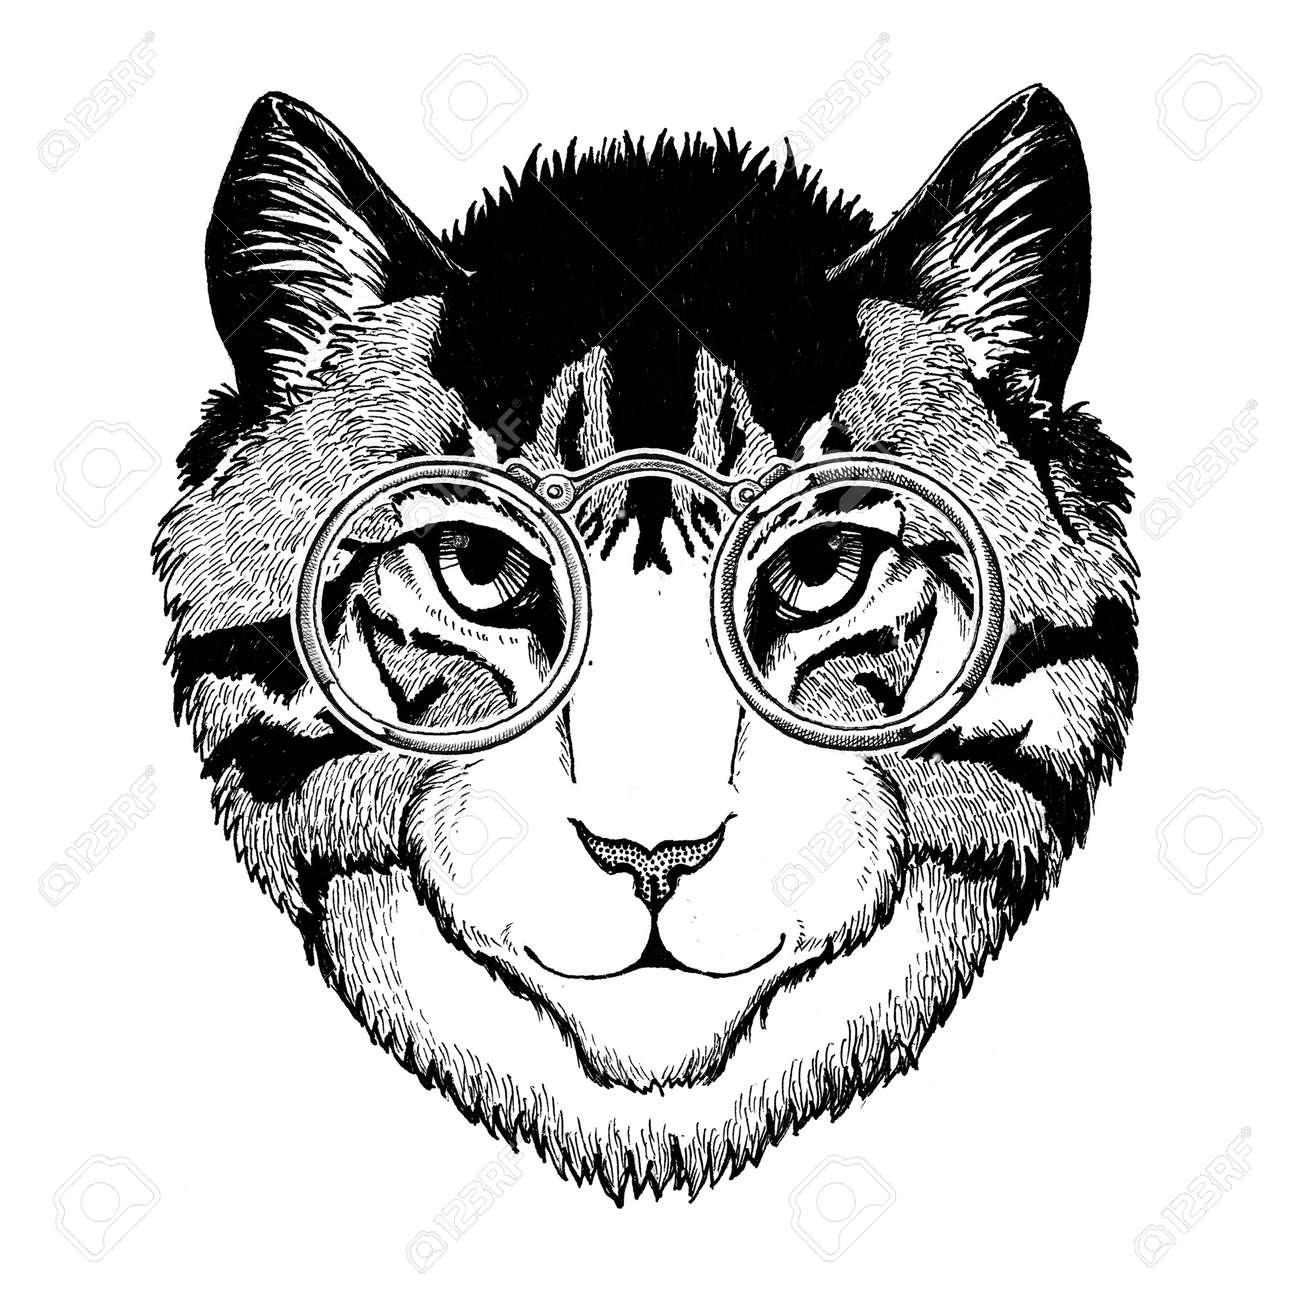 a37e1219c Cool wild cat Fashionable animal Hipster style Vintage illustration Image  for tattoo, logo, emblem